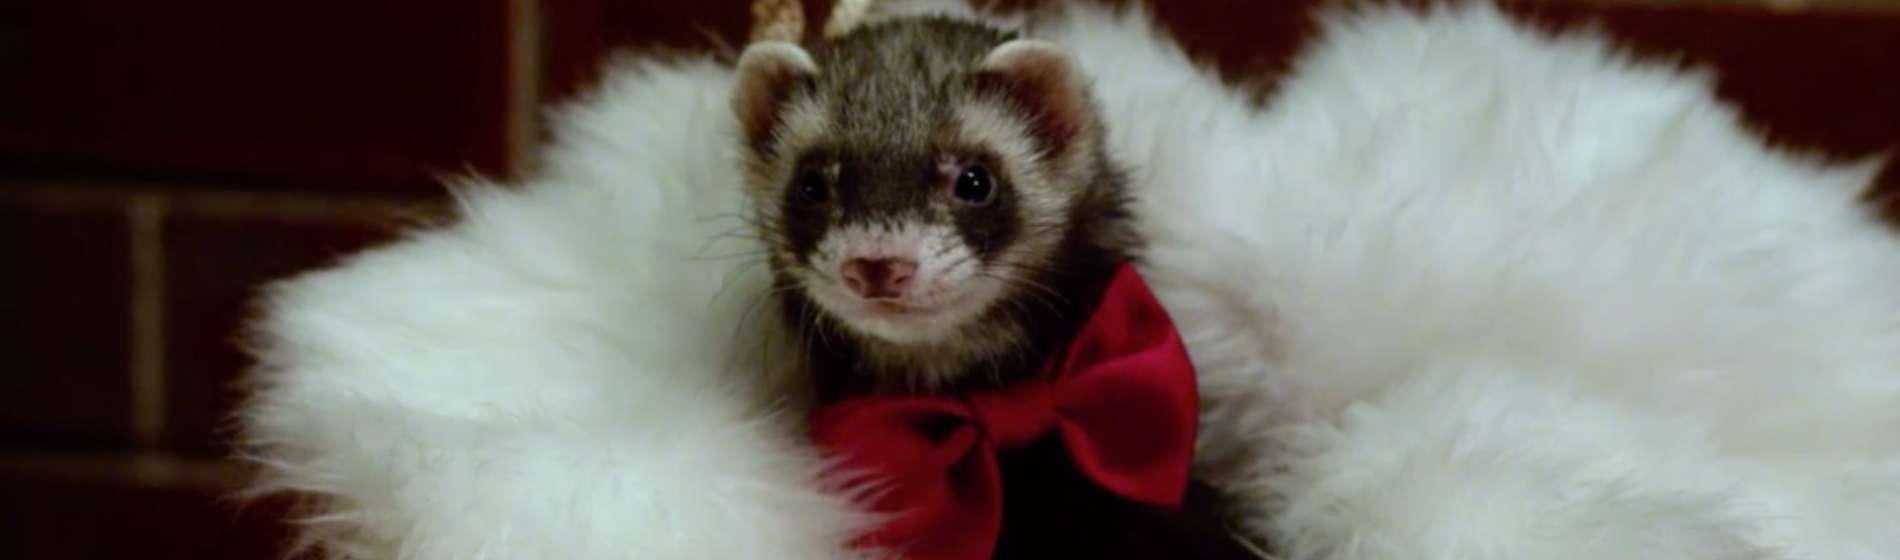 santas-little-ferrets-image-01